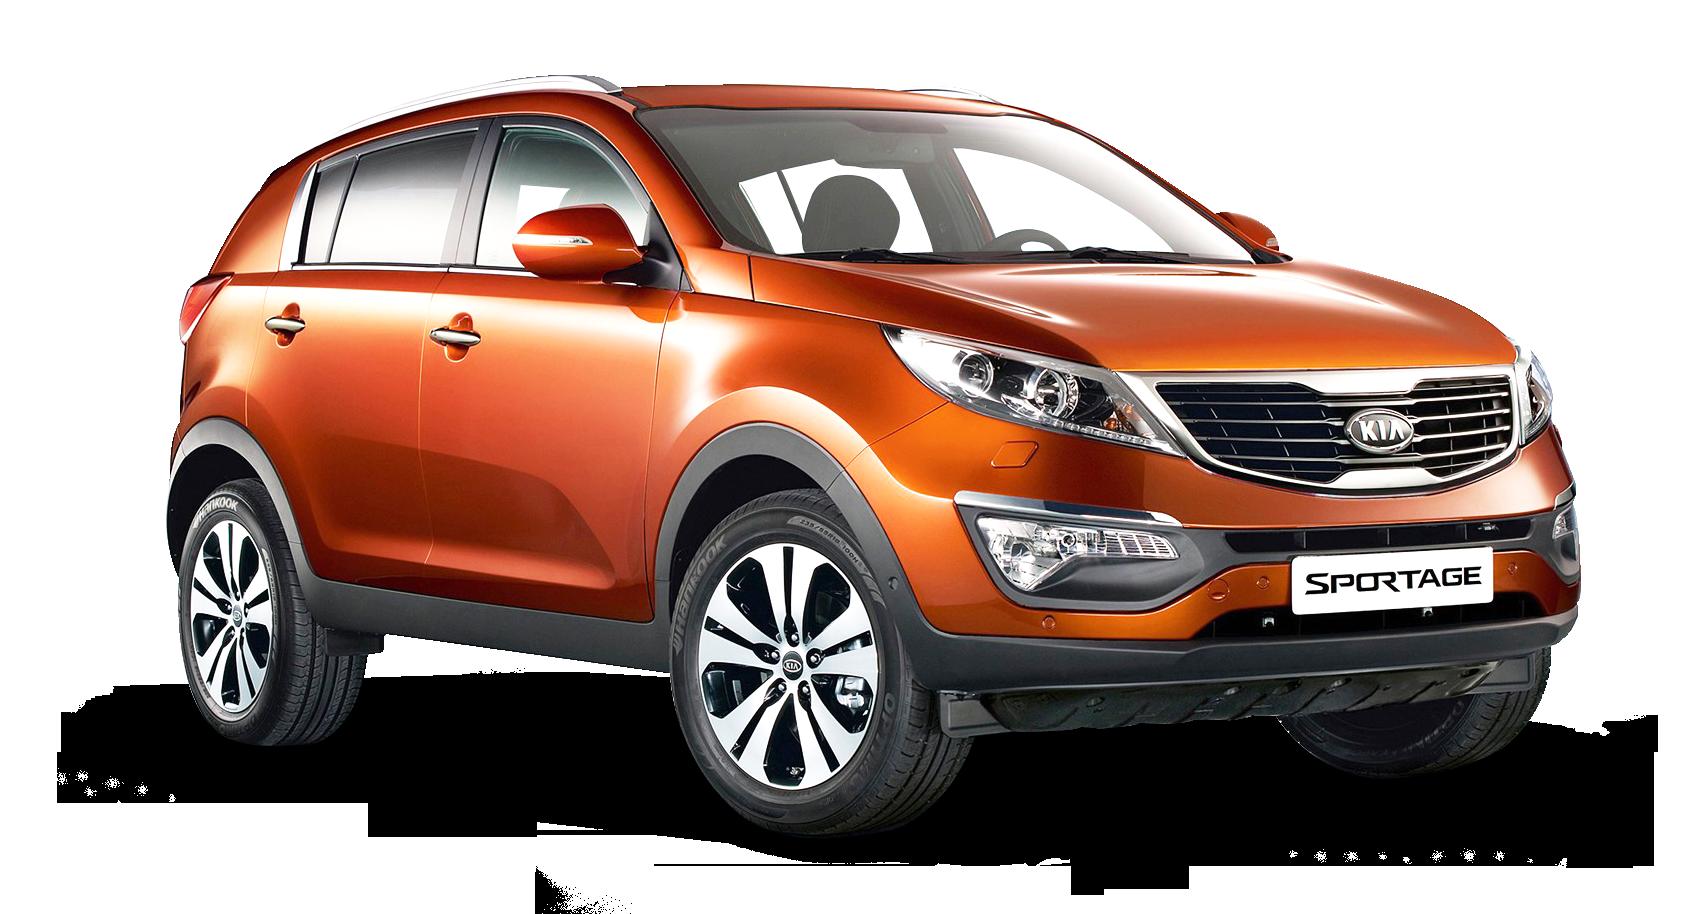 Kia Sportage 3 Orange Car PNG Image.